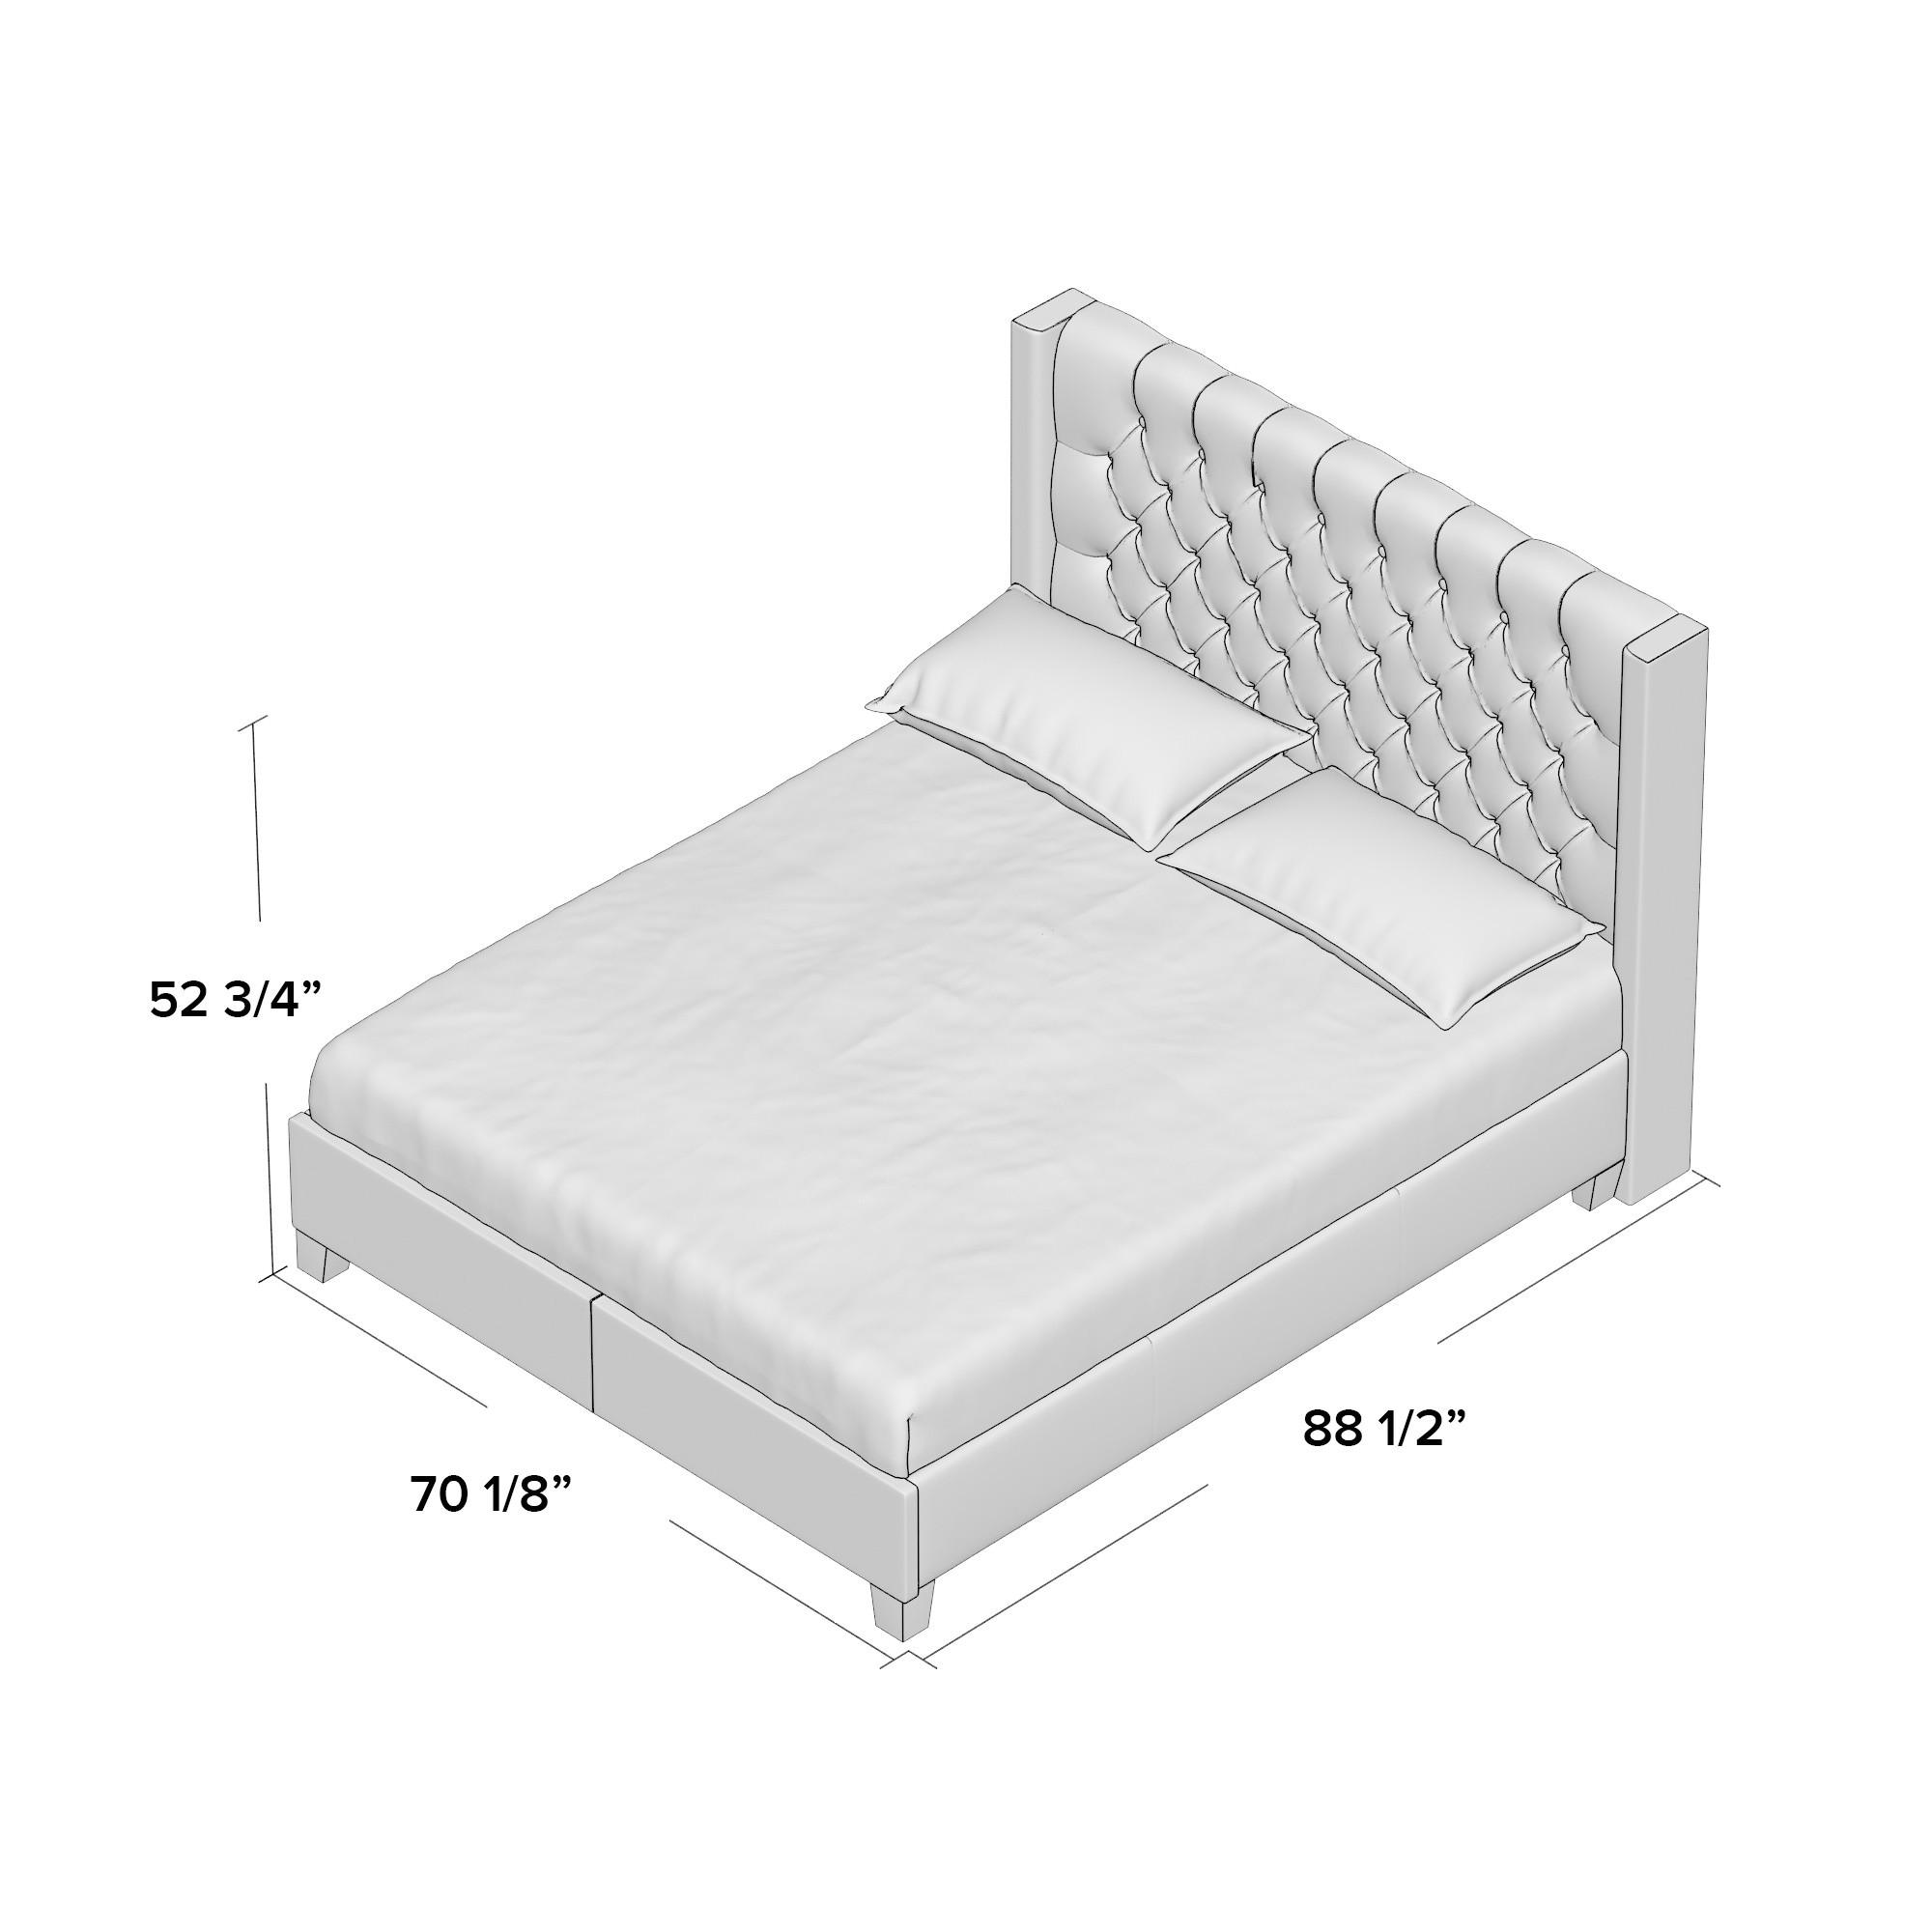 three posts crawley upholstered platform bed thre8850 piid 5b0 5d 19023334